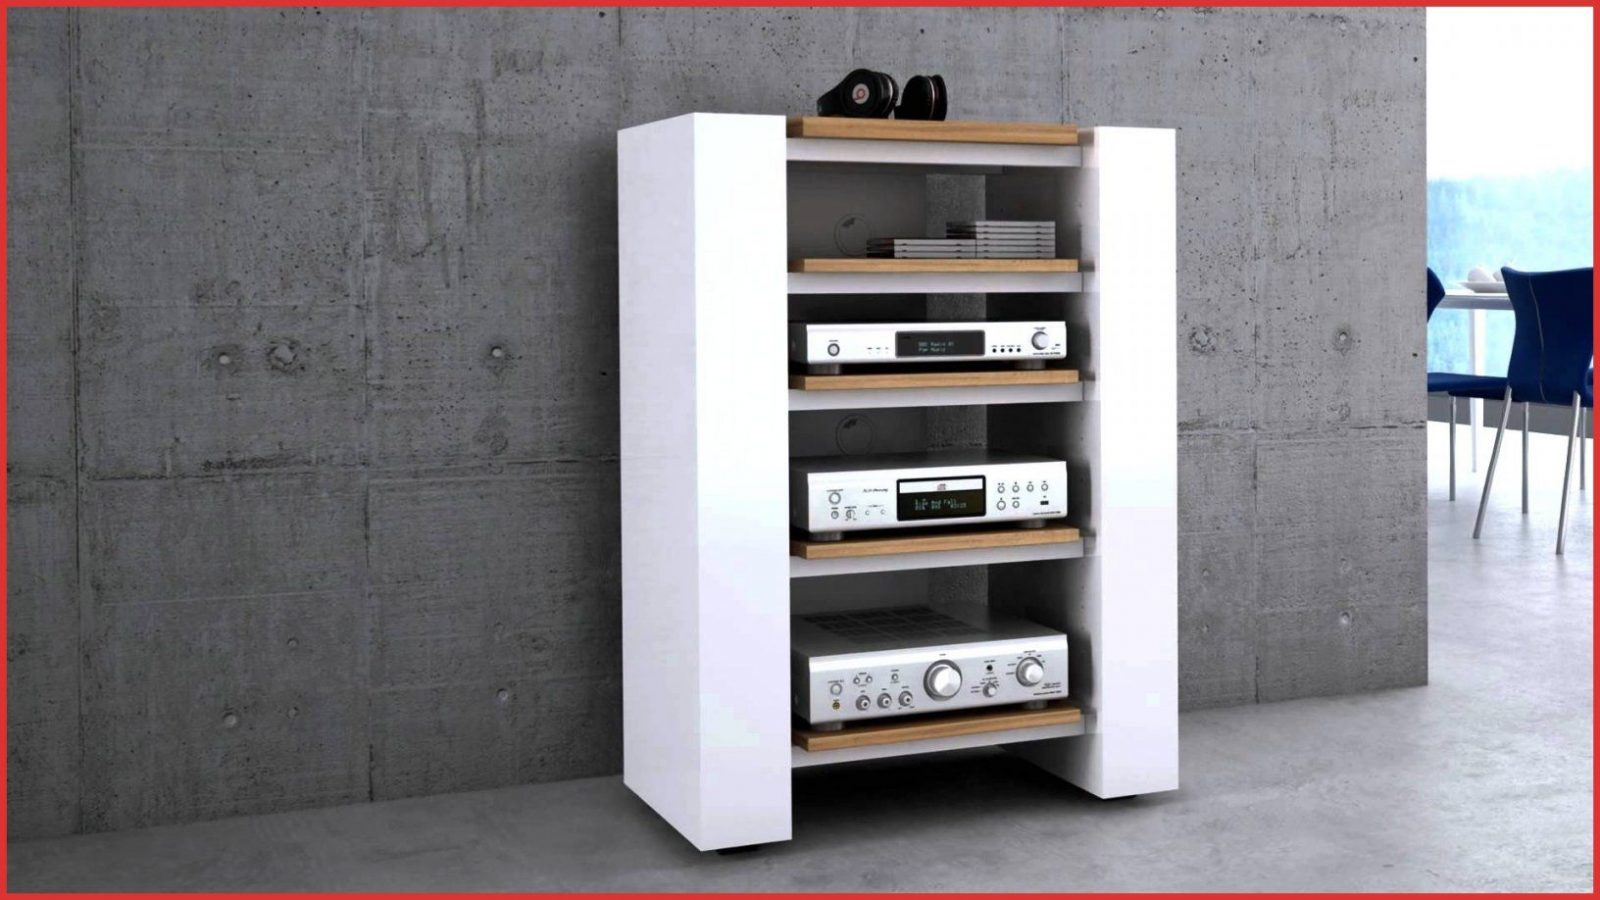 Hifi Möbel Holz 28456 Enorm Tv Möbel Selber Bauen Hifi M C3 B6Bel von Tv Möbel Selbst Bauen Bild